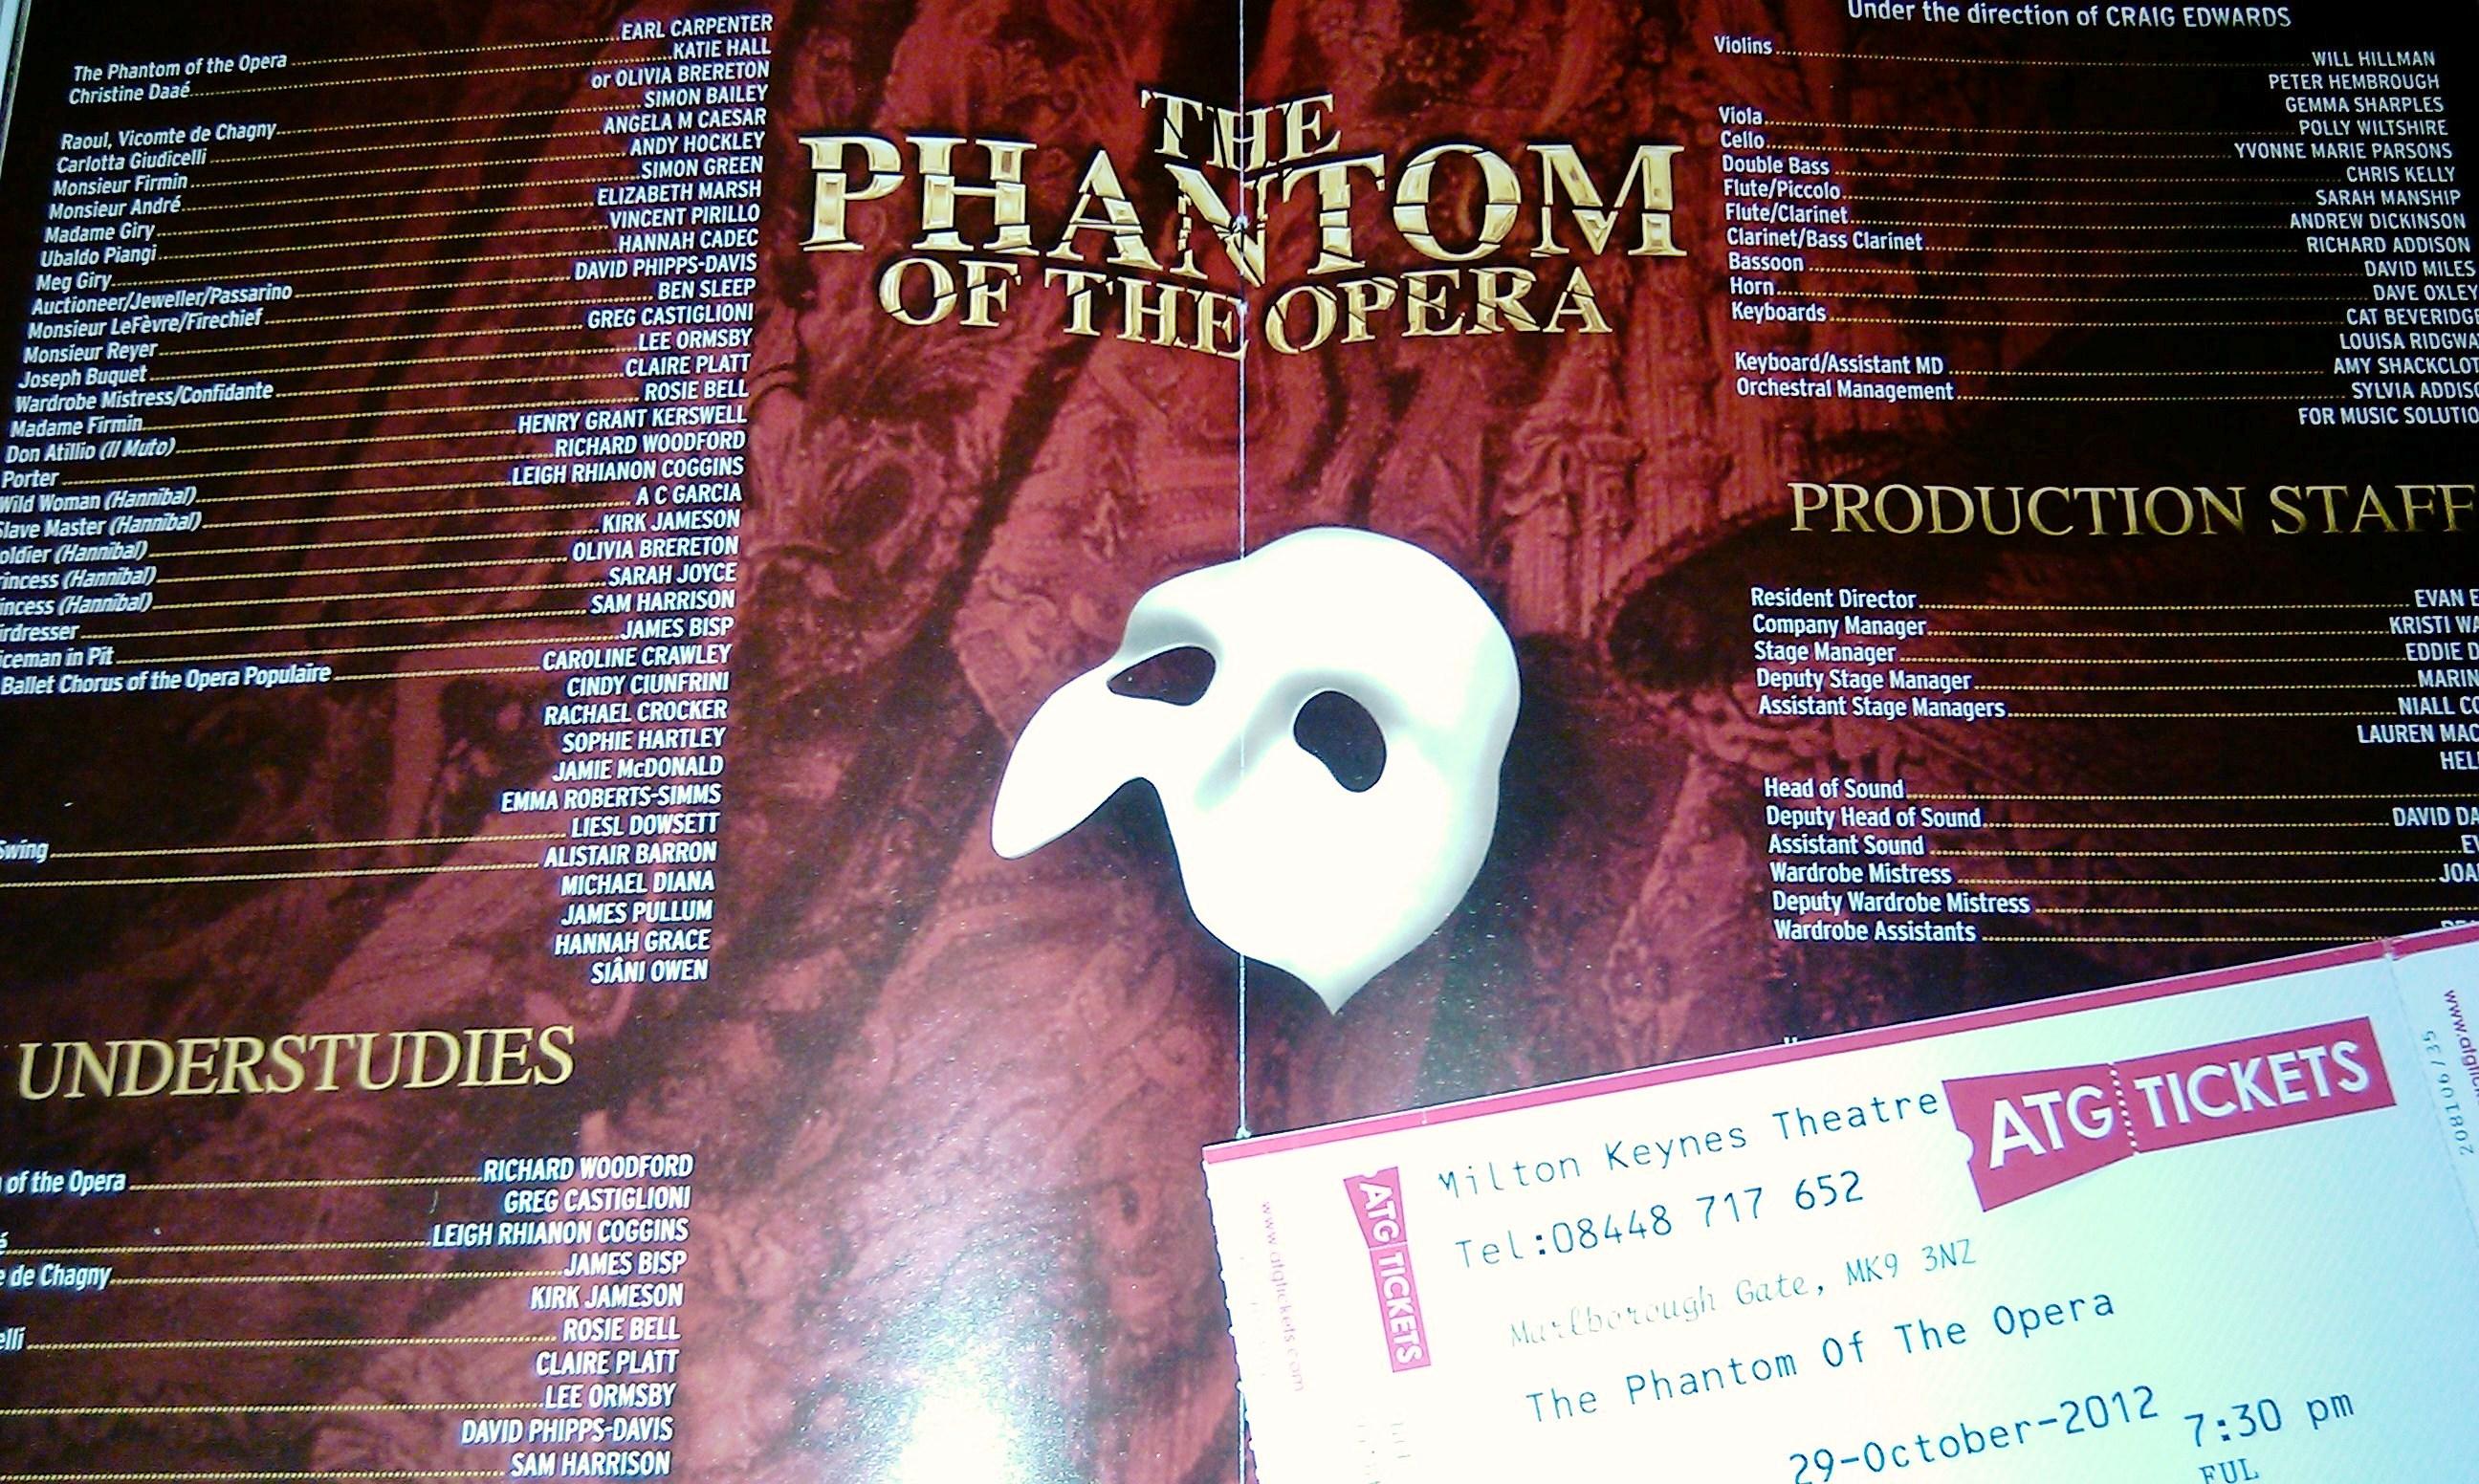 The Phantom of The Opera MK Theatre